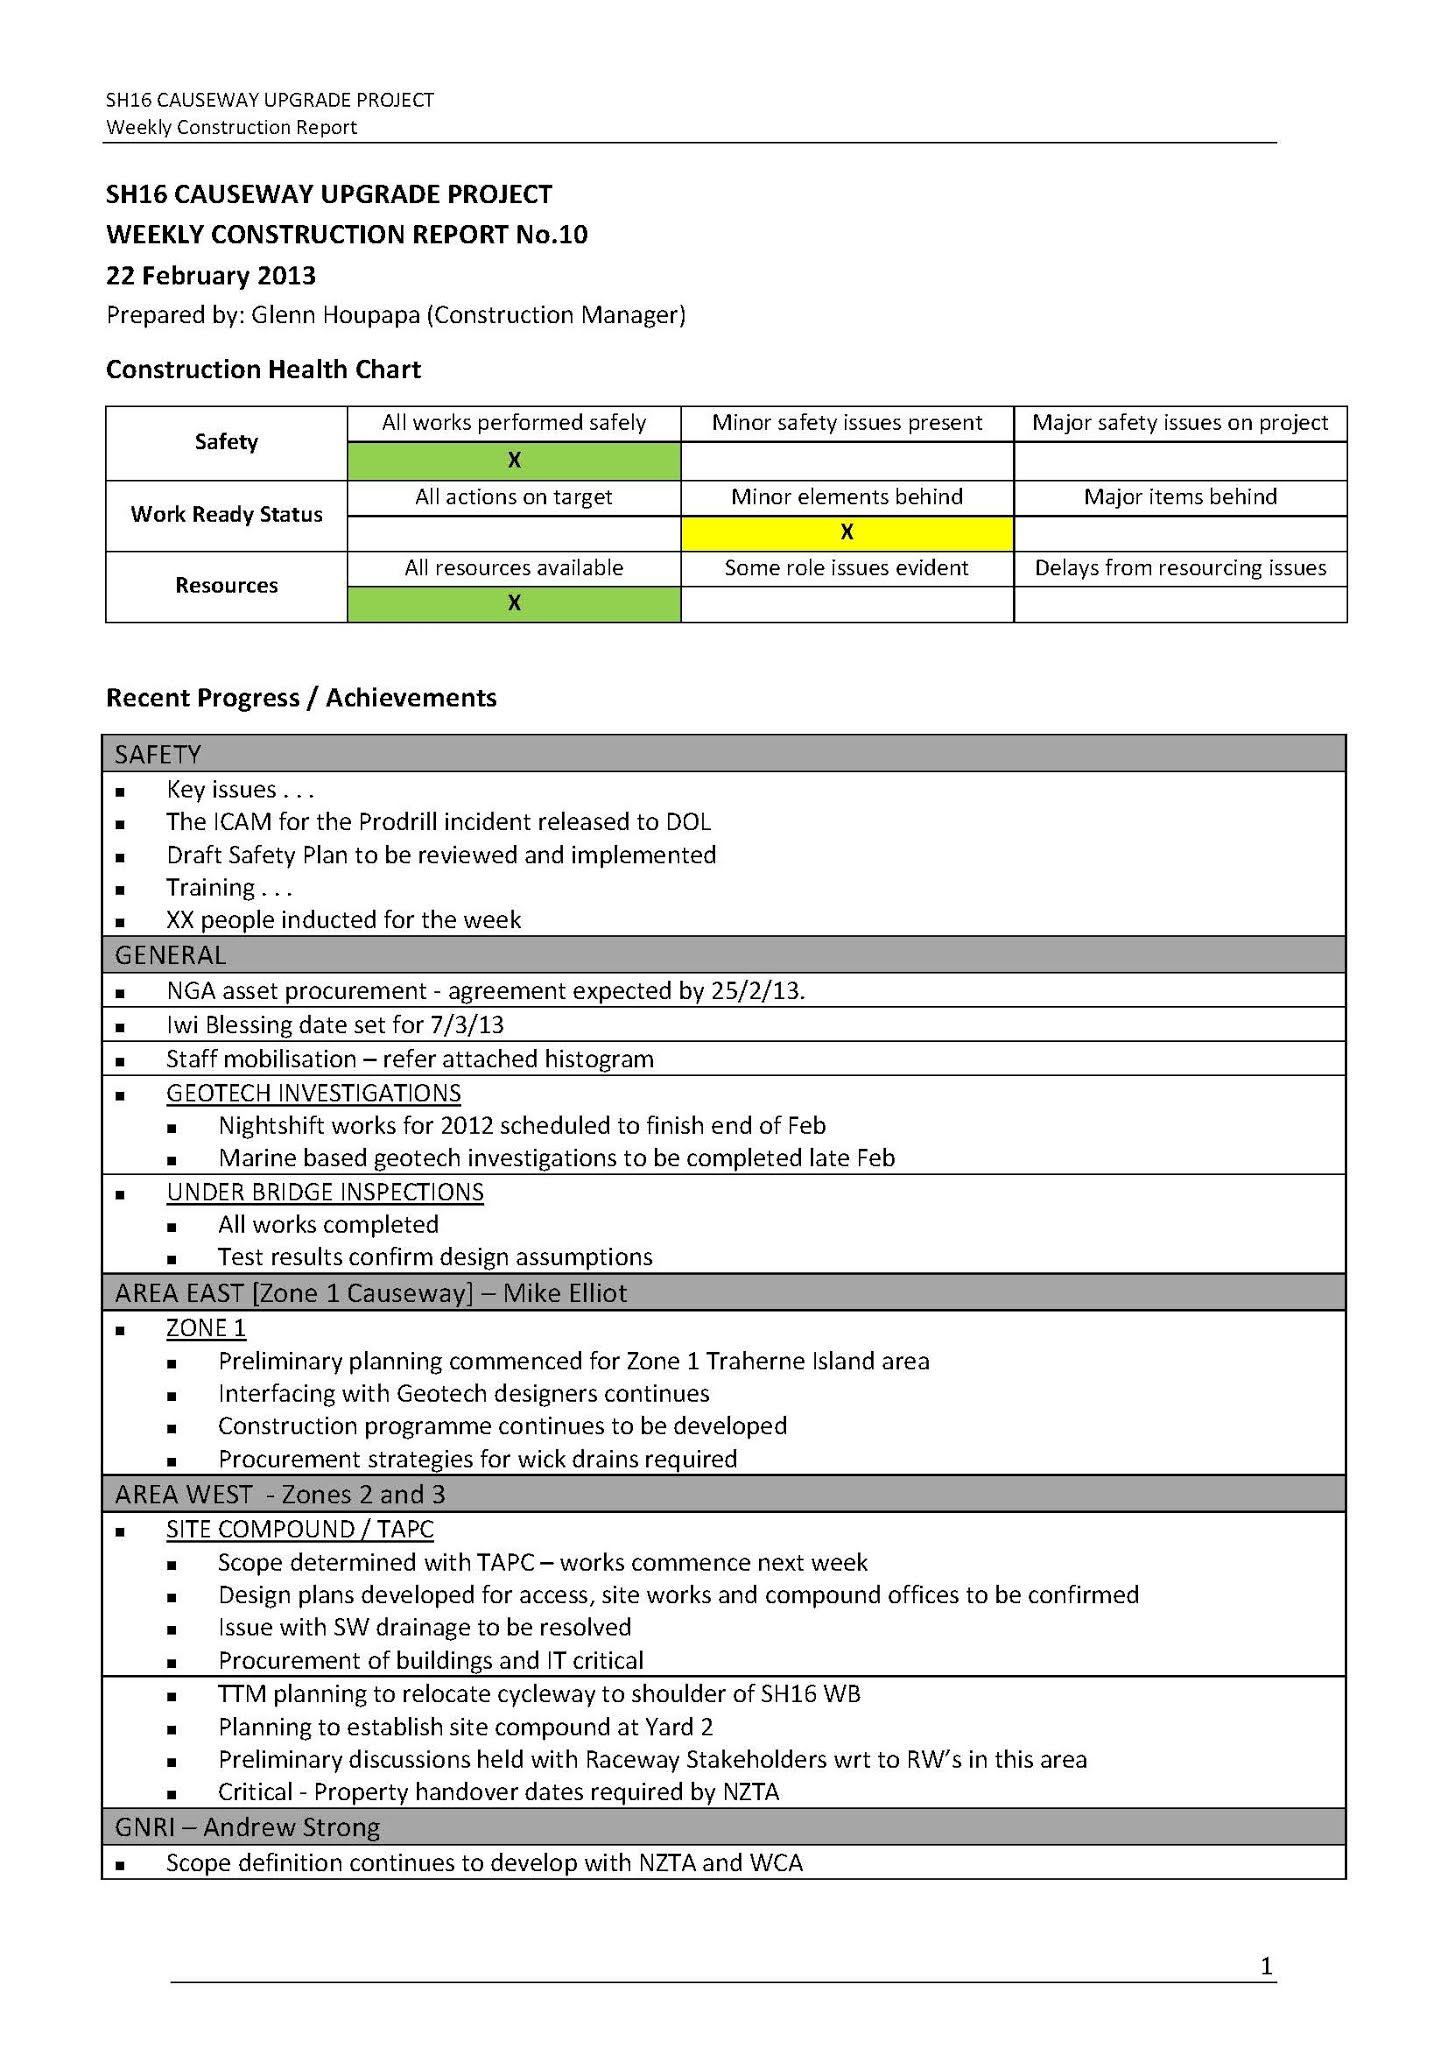 Construction weekly progress report example